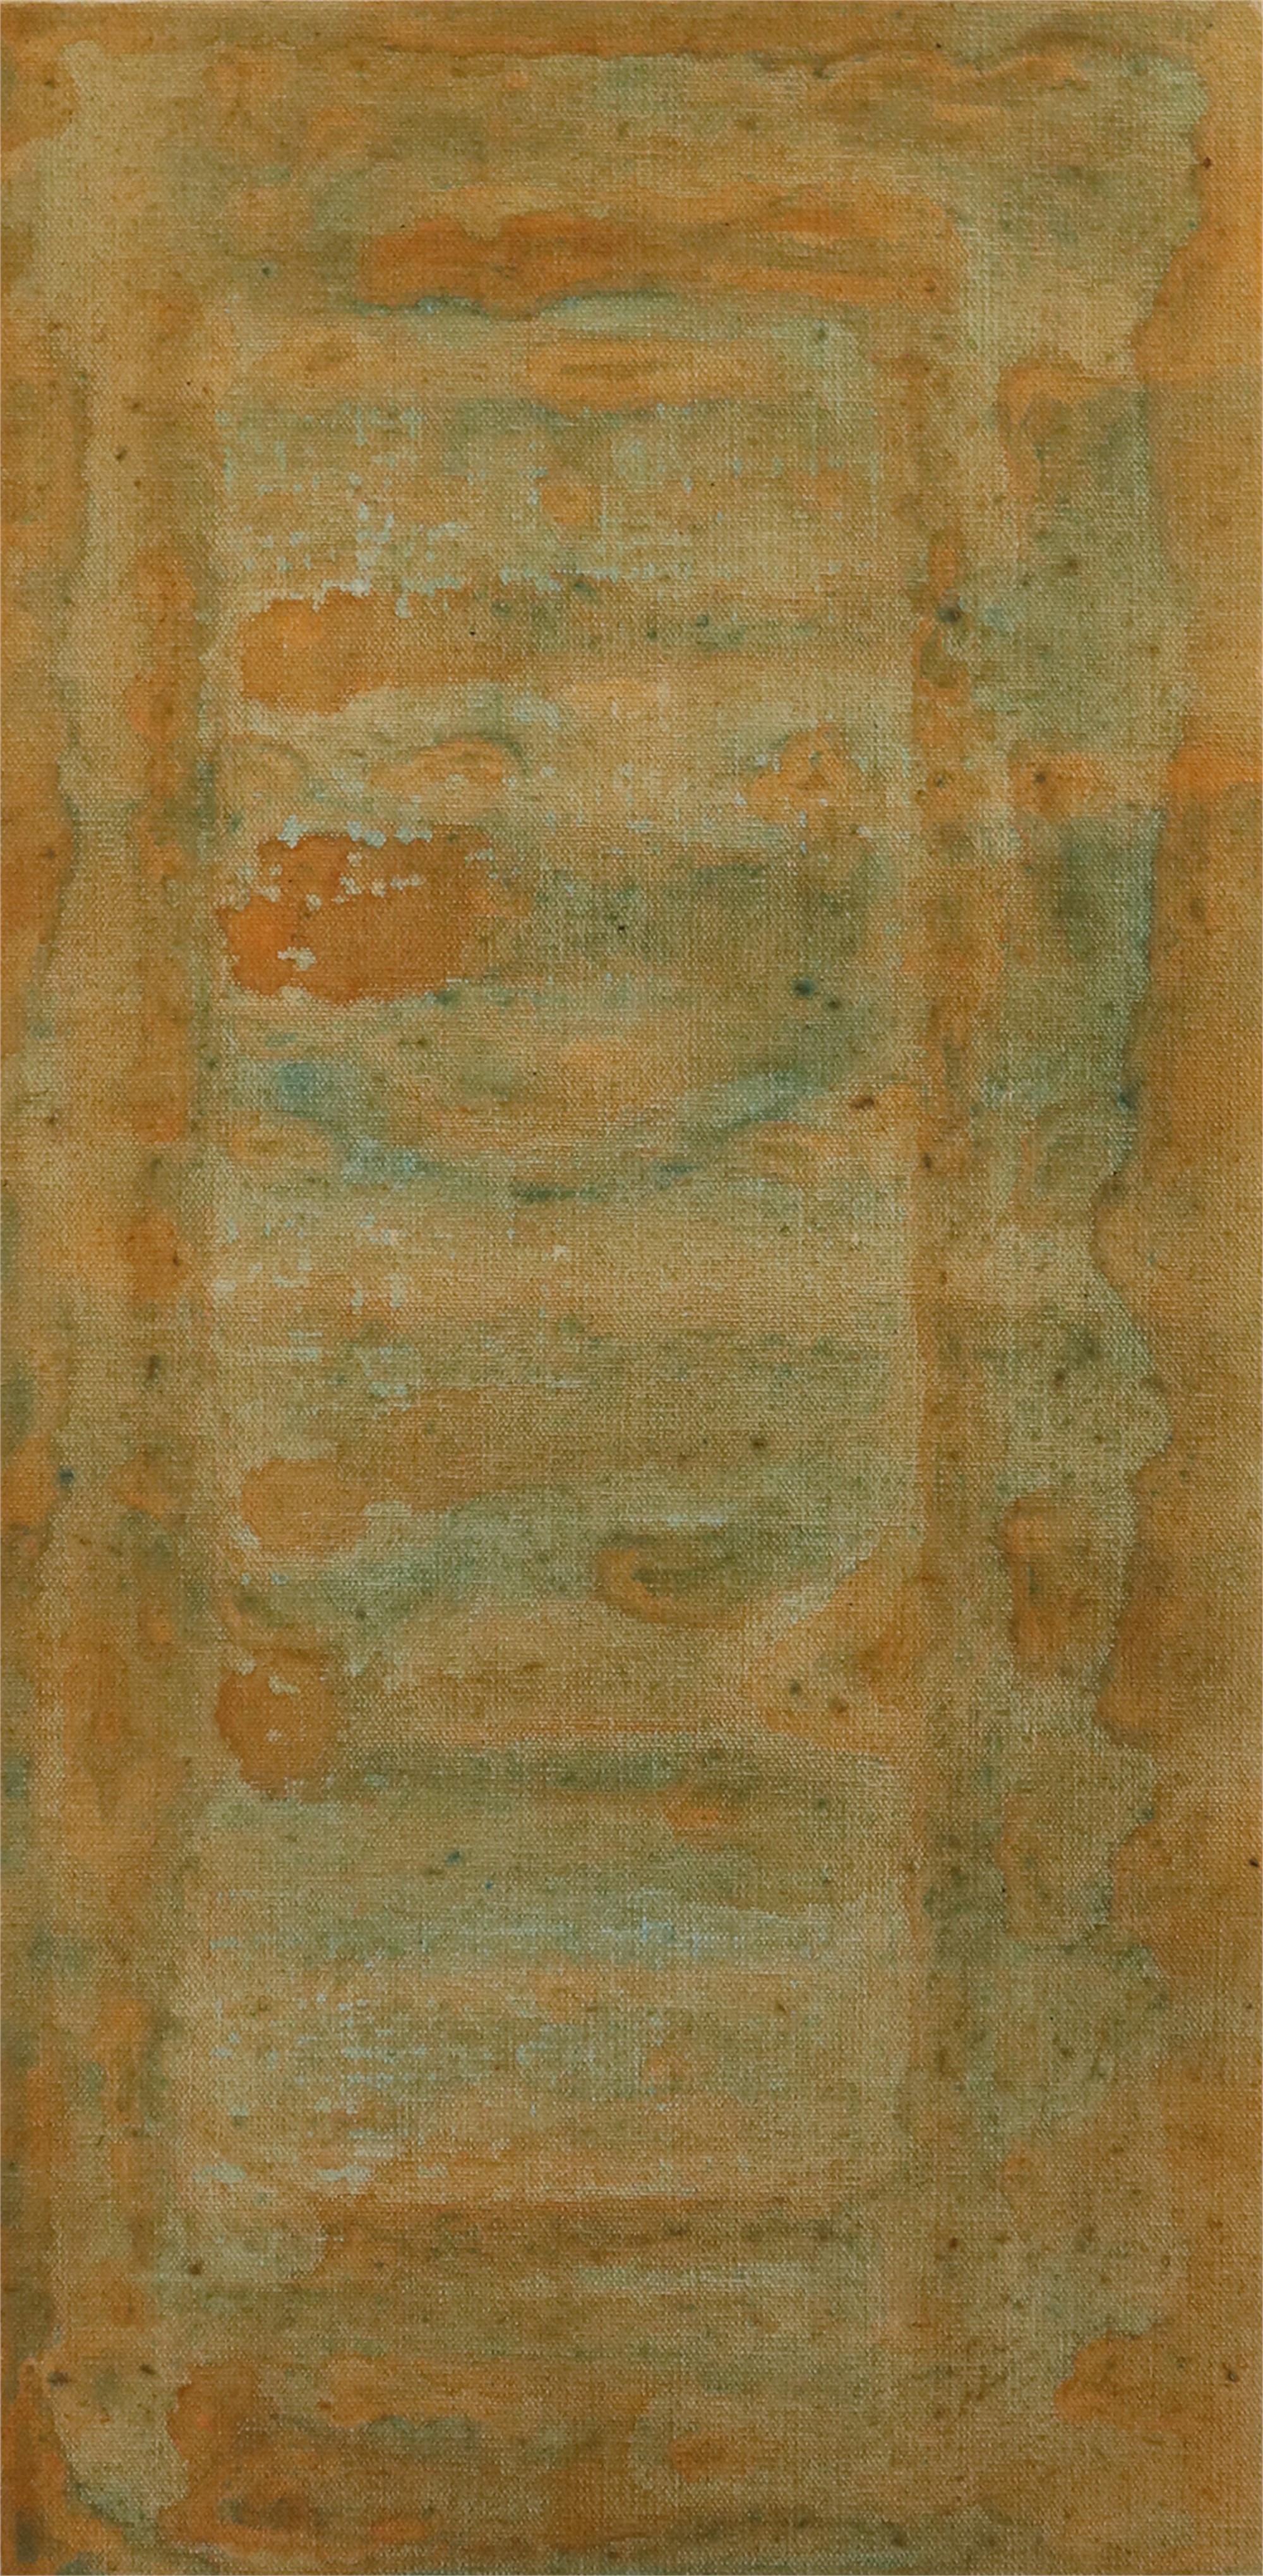 Codex I by Steven Anton Rehage